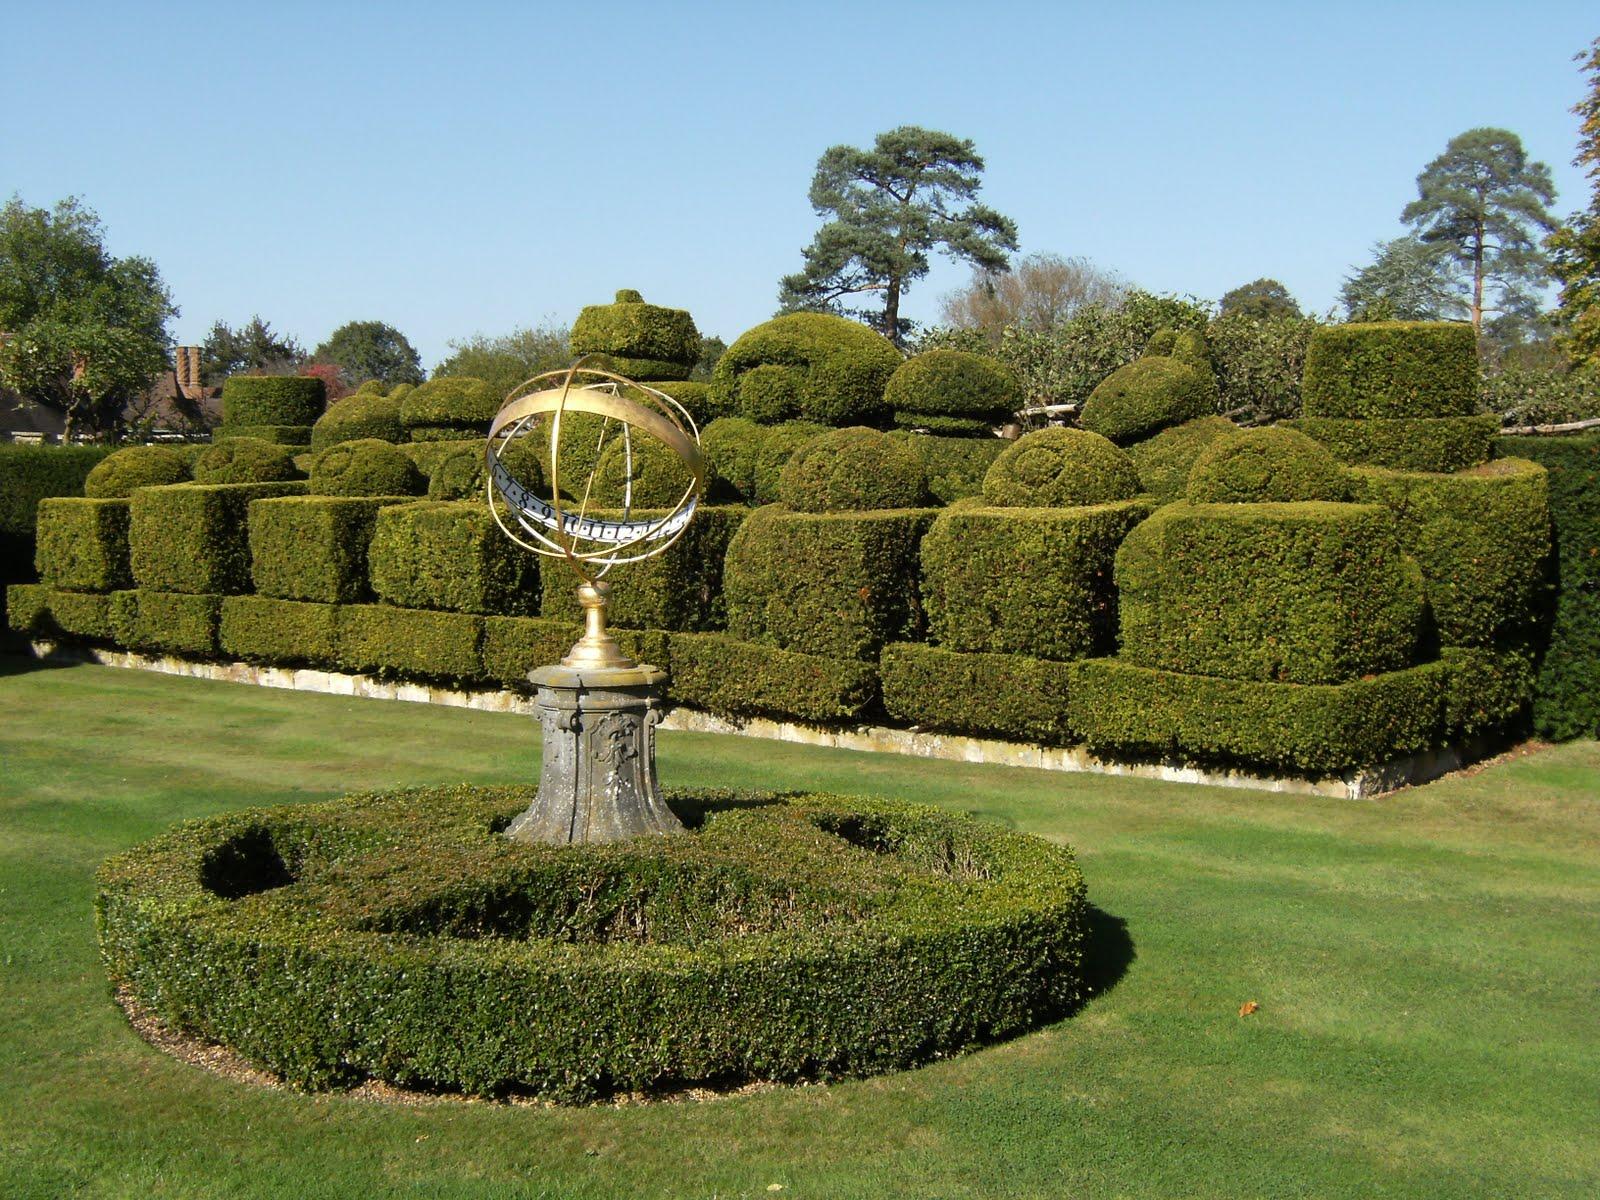 DSCF1974 Chess-set topiary in Hever Castle gardens